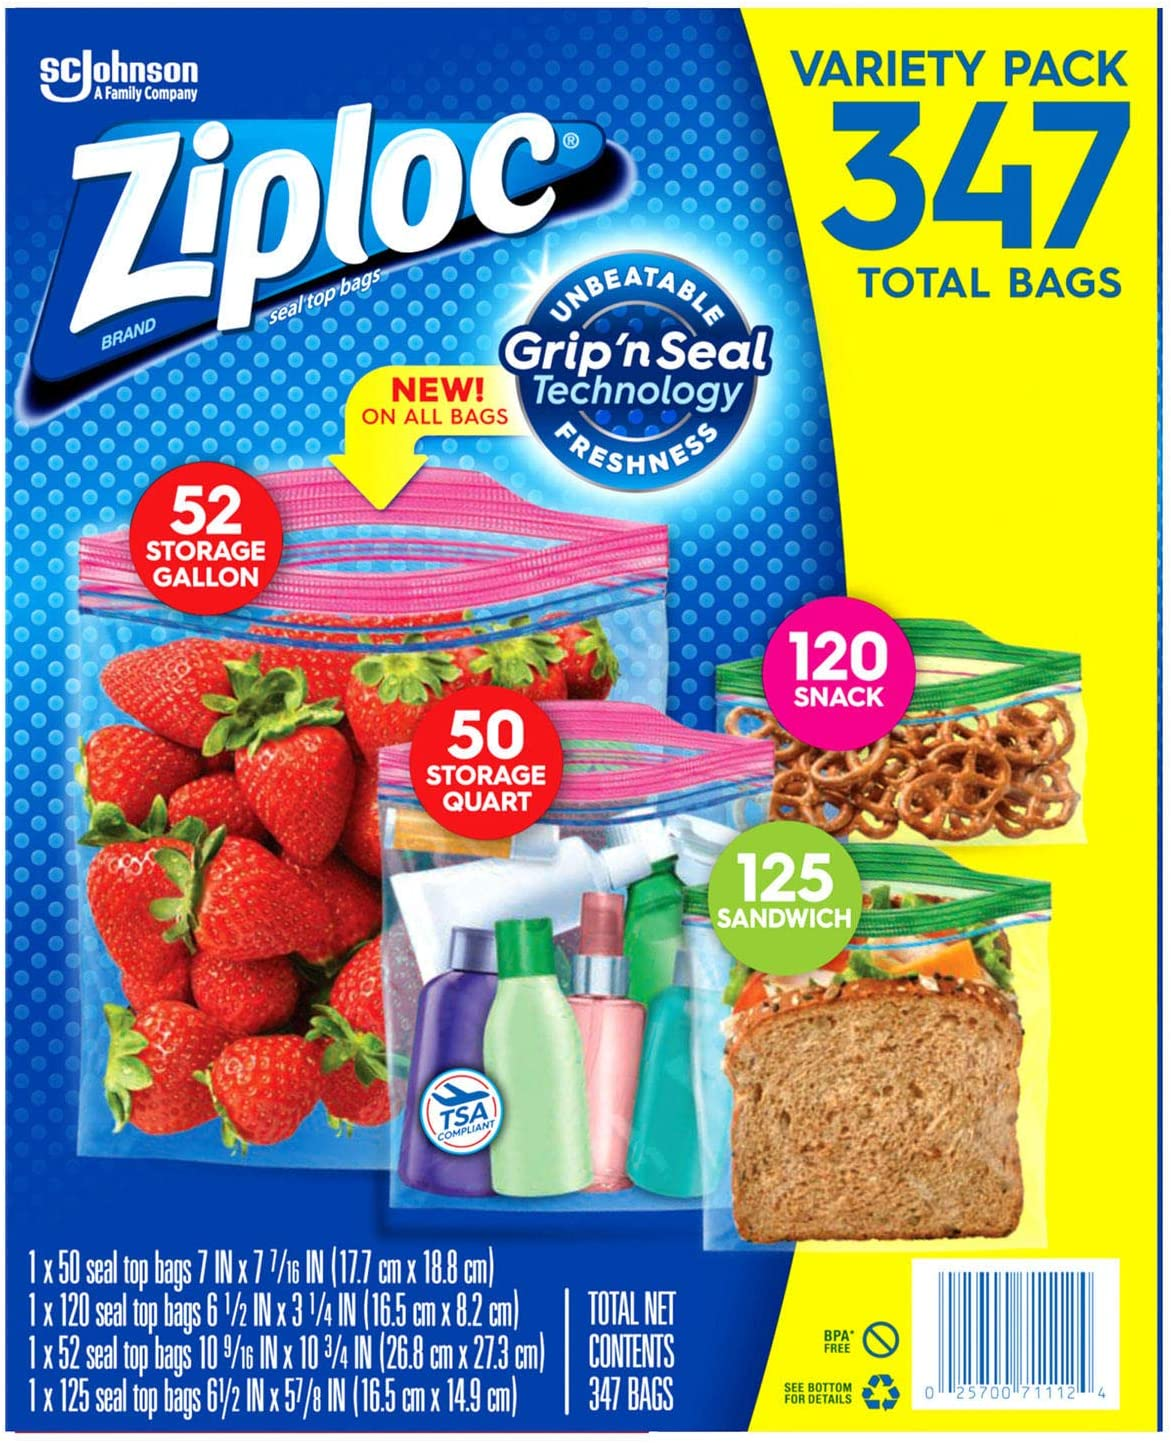 Ziploc Gallon, Quart, Snack & Sandwich Bags (Variety 347 Bags)